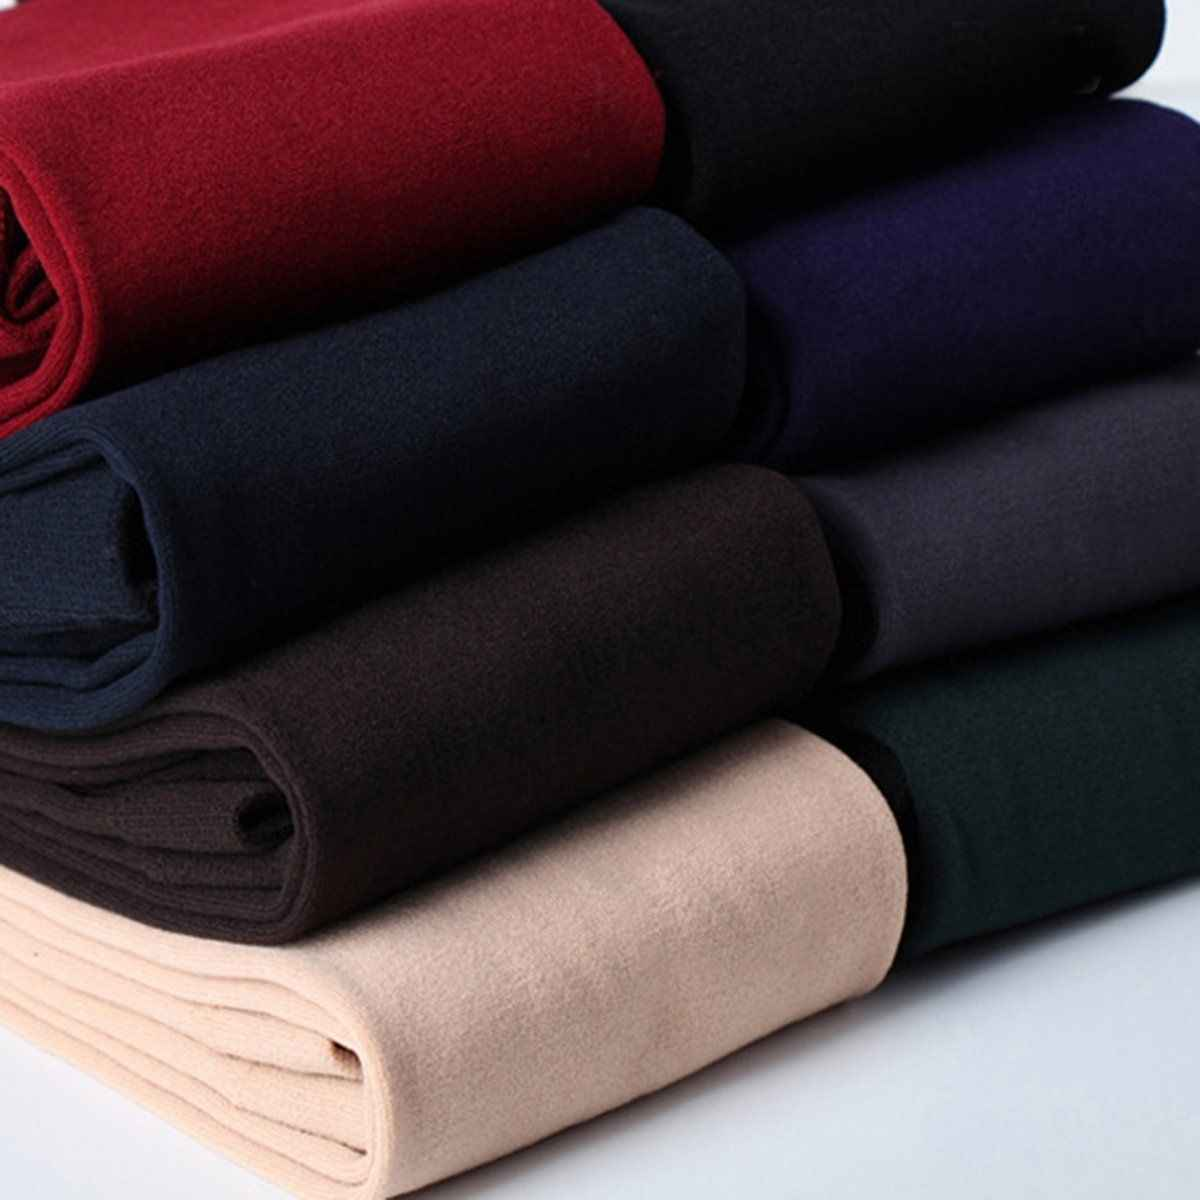 Hot Sale Wanita Panas Musim Dingin Hangat Tebal Bulu Berjajar Kurus Slim Legging Peregangan Celana